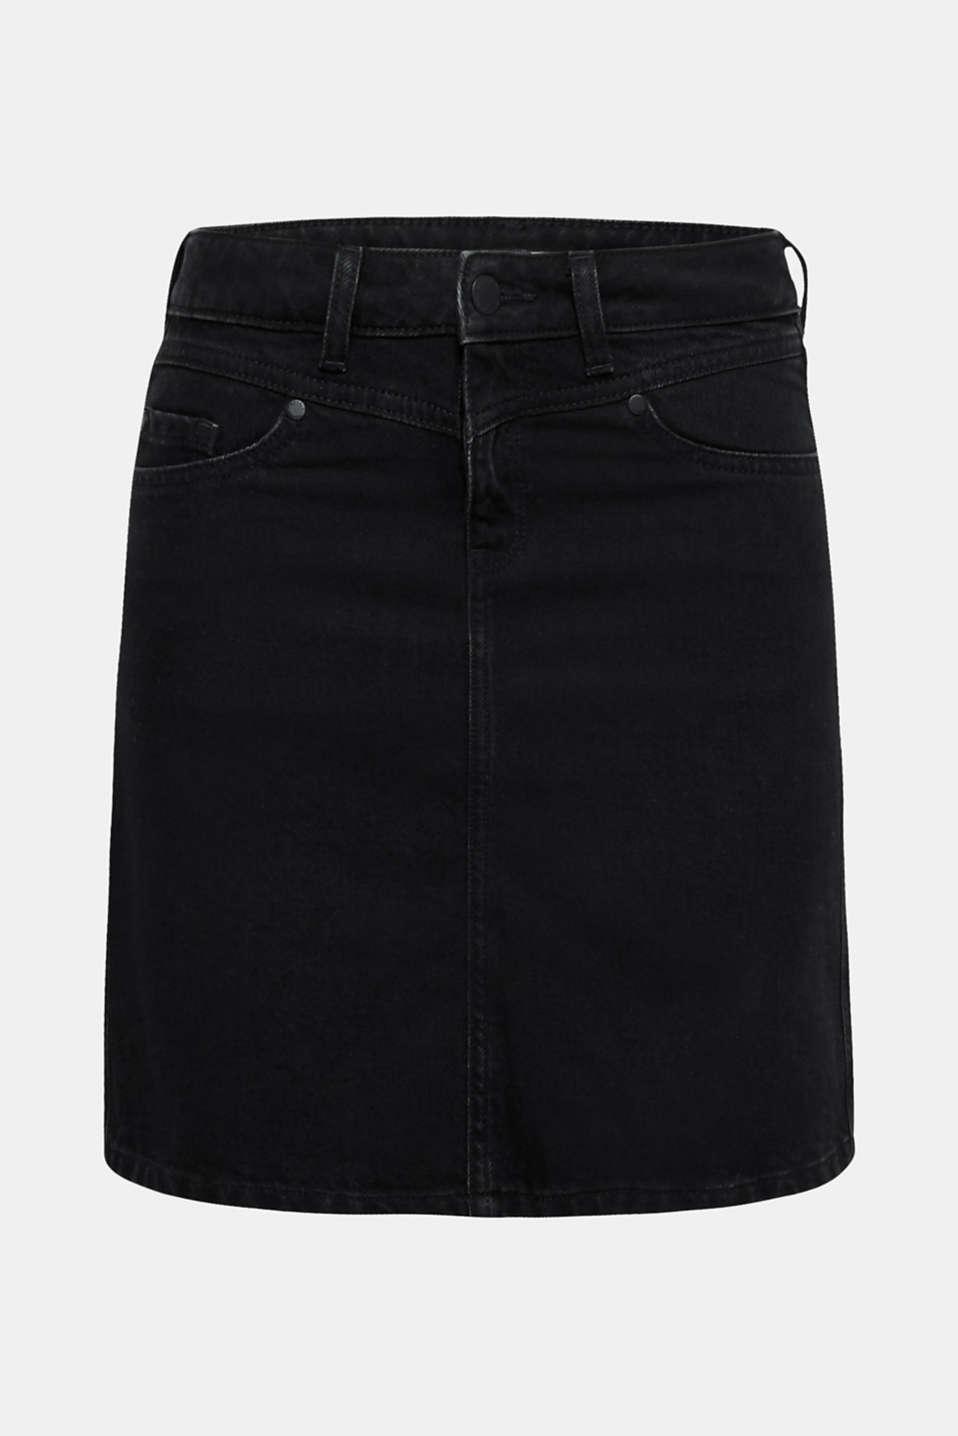 Skirts denim, BLACK DARK WASH, detail image number 7